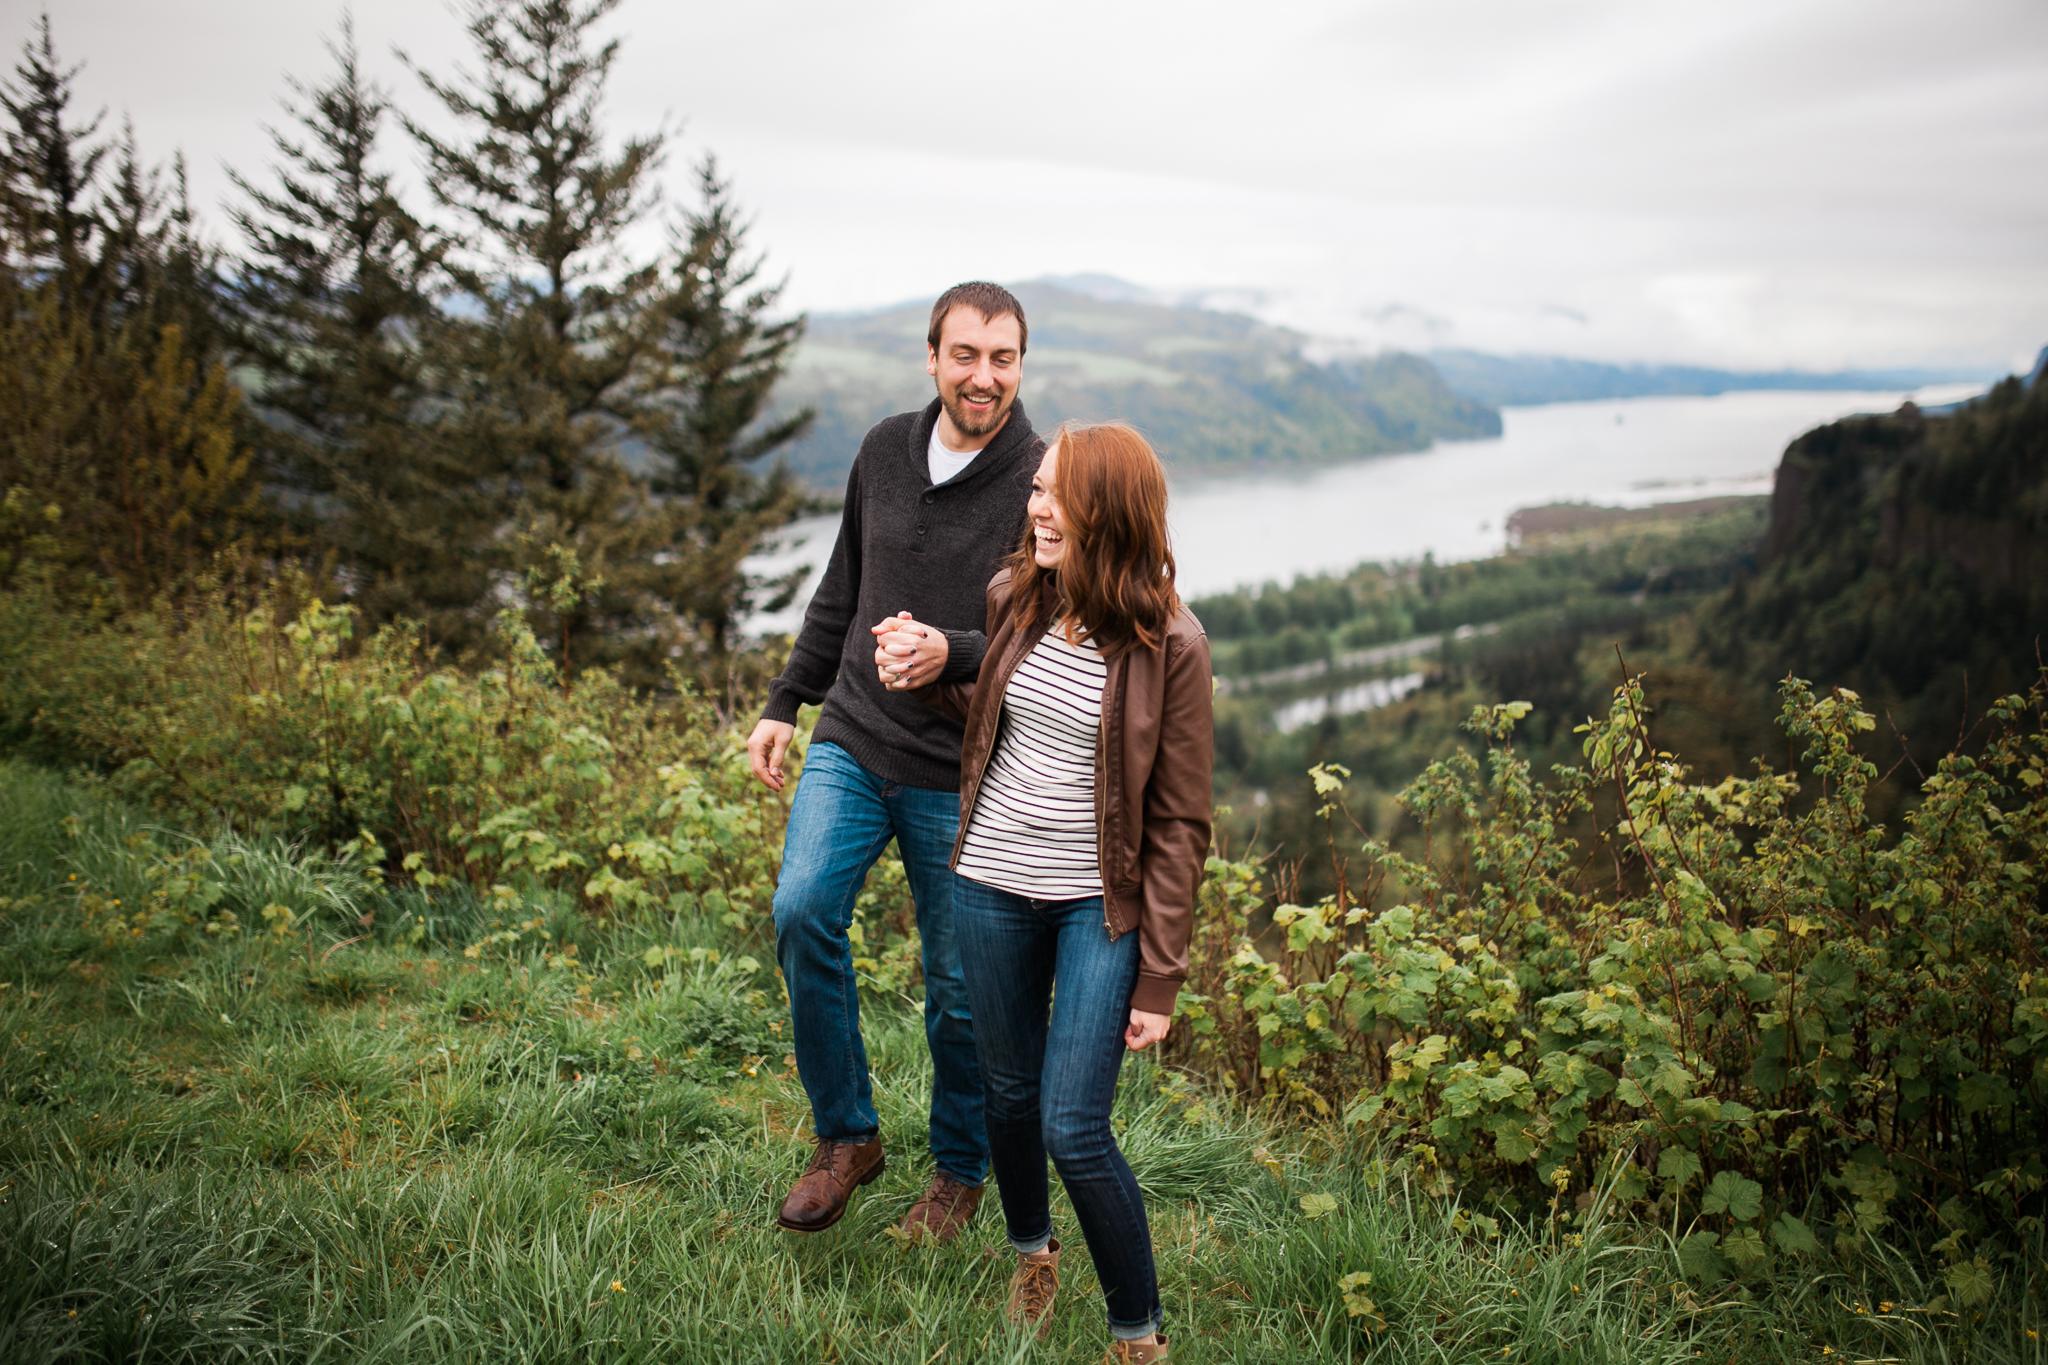 Portland-Oregon-Engagement-Jen-Dederich-Photography_008.jpg